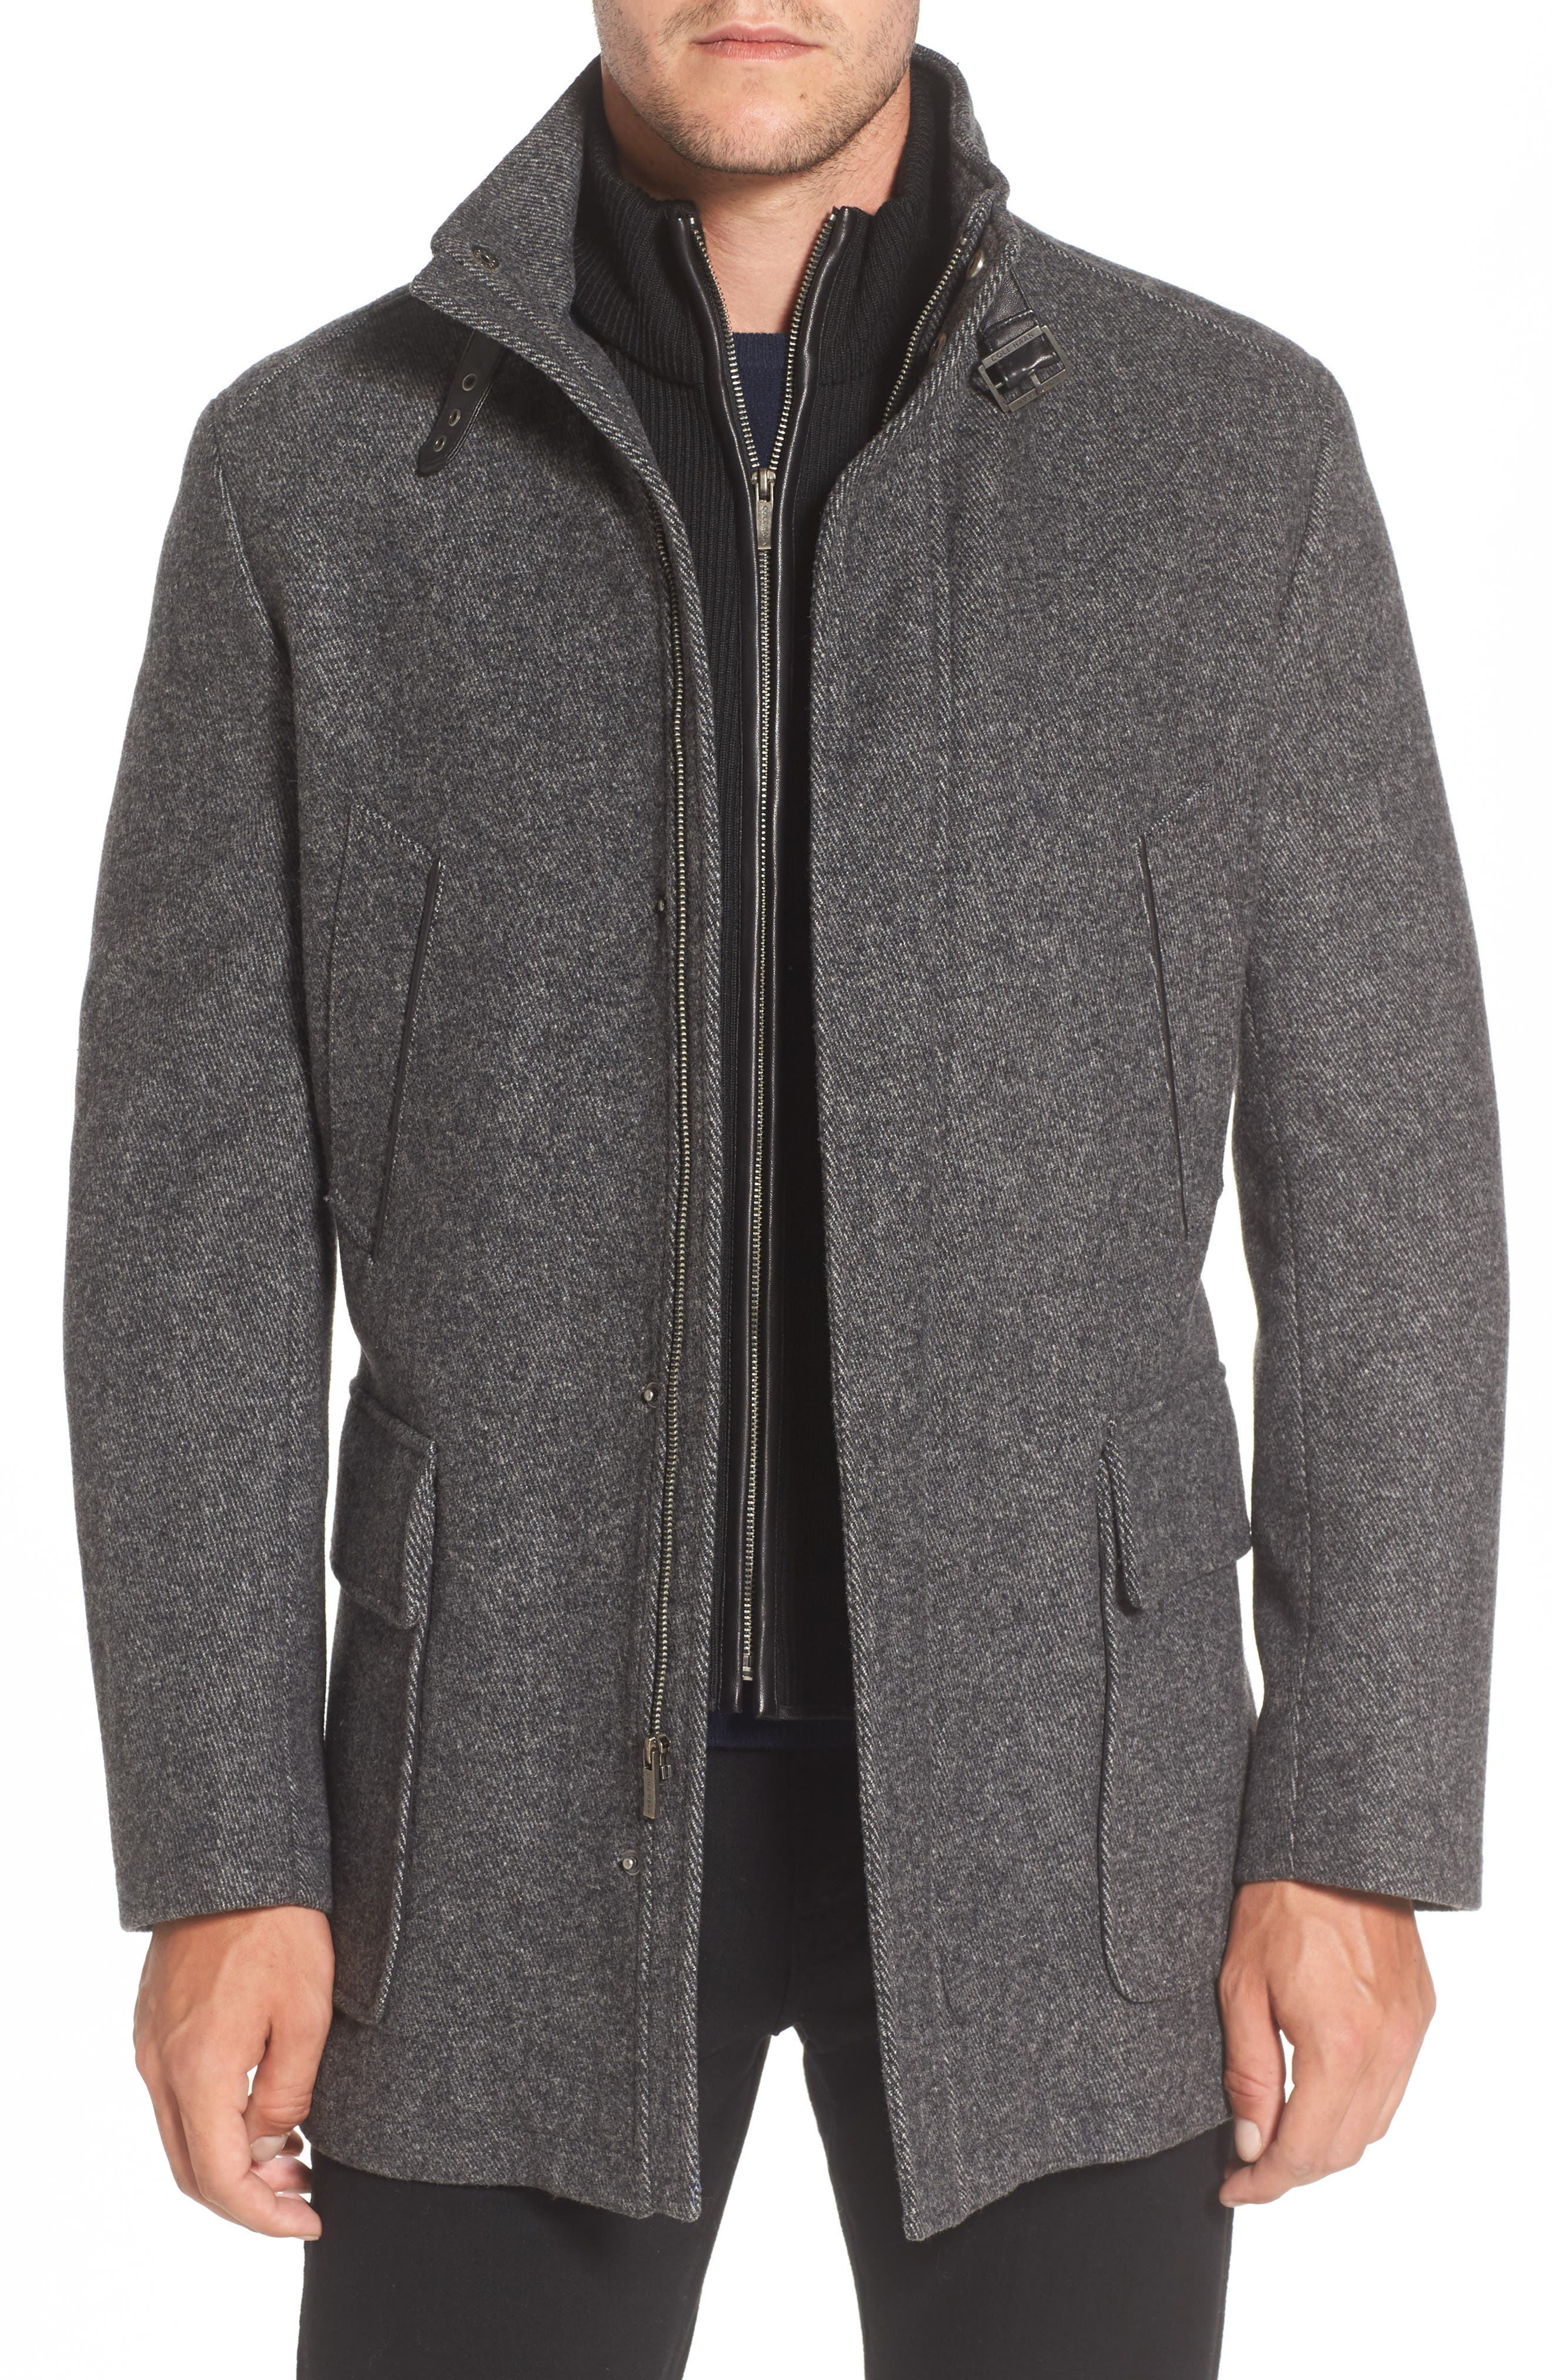 Wool Blend Car Coat with Removable Knit Bib,                         Main,                         color, Melange Graphite